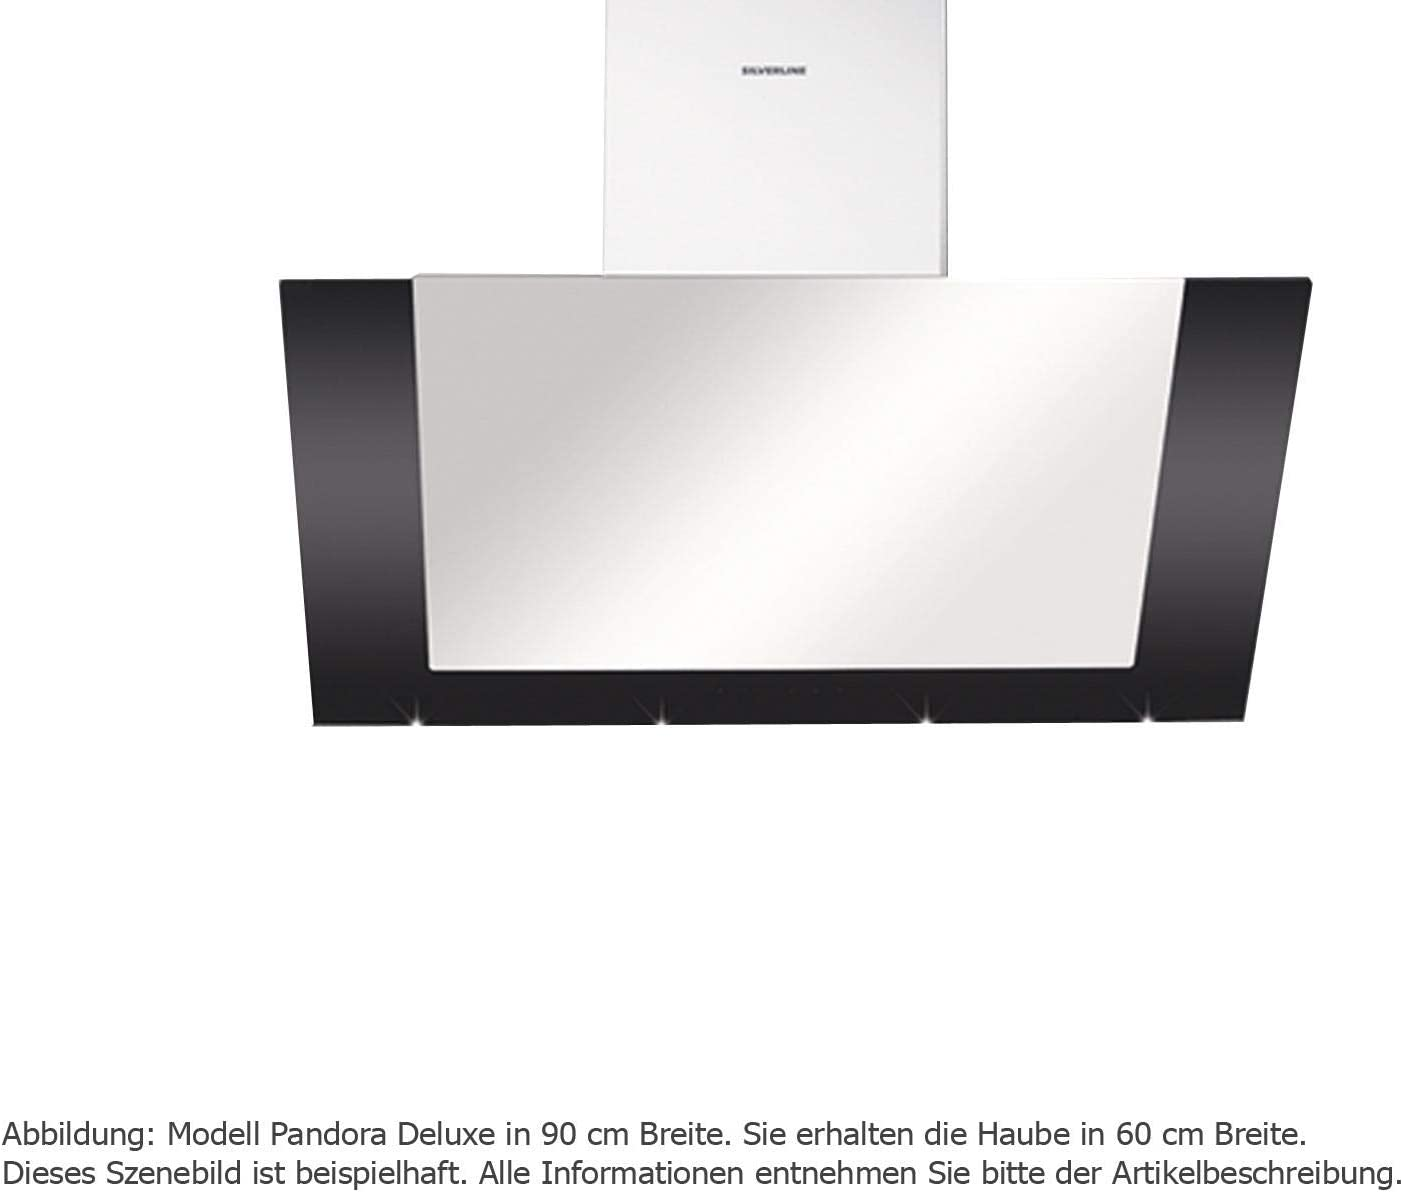 Silverline PAW 685.1 SE Pandora Deluxe - Campana extractora de pared (59,6 cm)